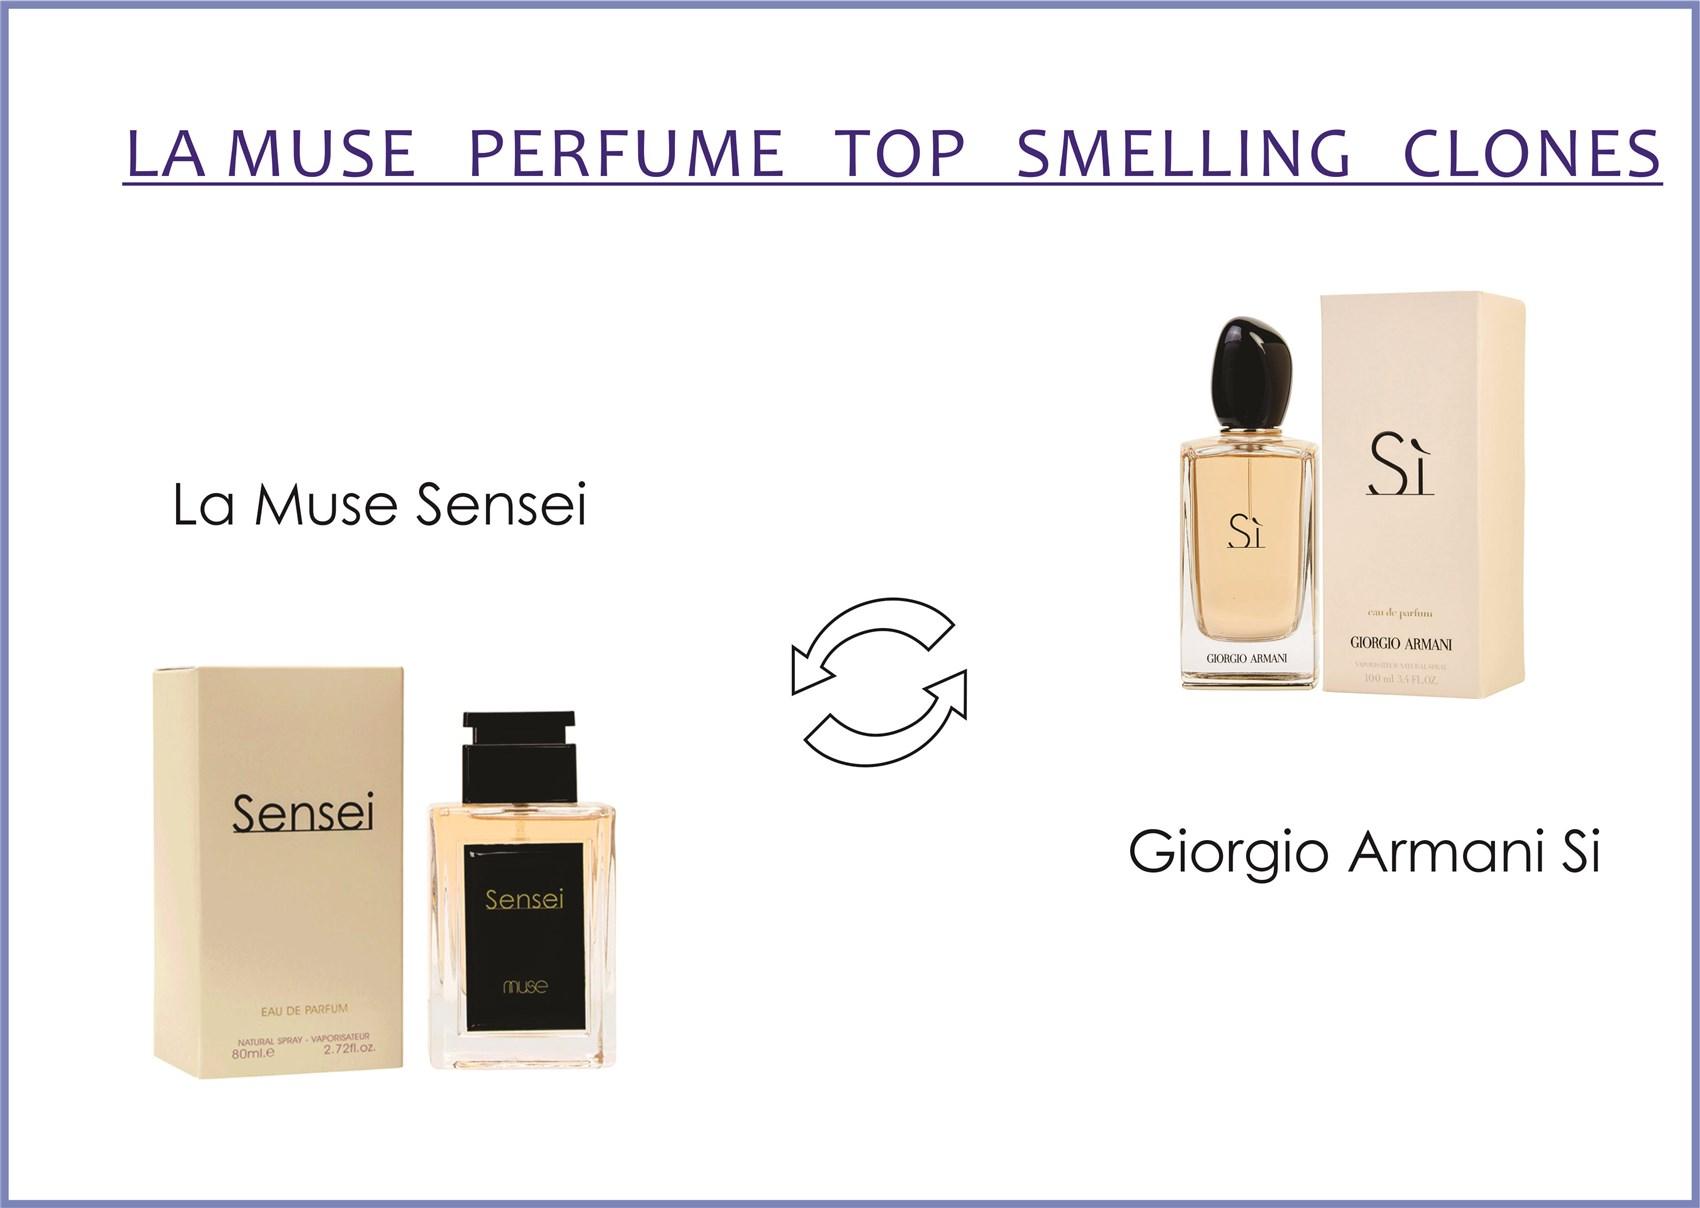 la-muse-sensei-for-women-100-ml-edp-by-lattafa-perfumes-giorgio-armani-perfumes